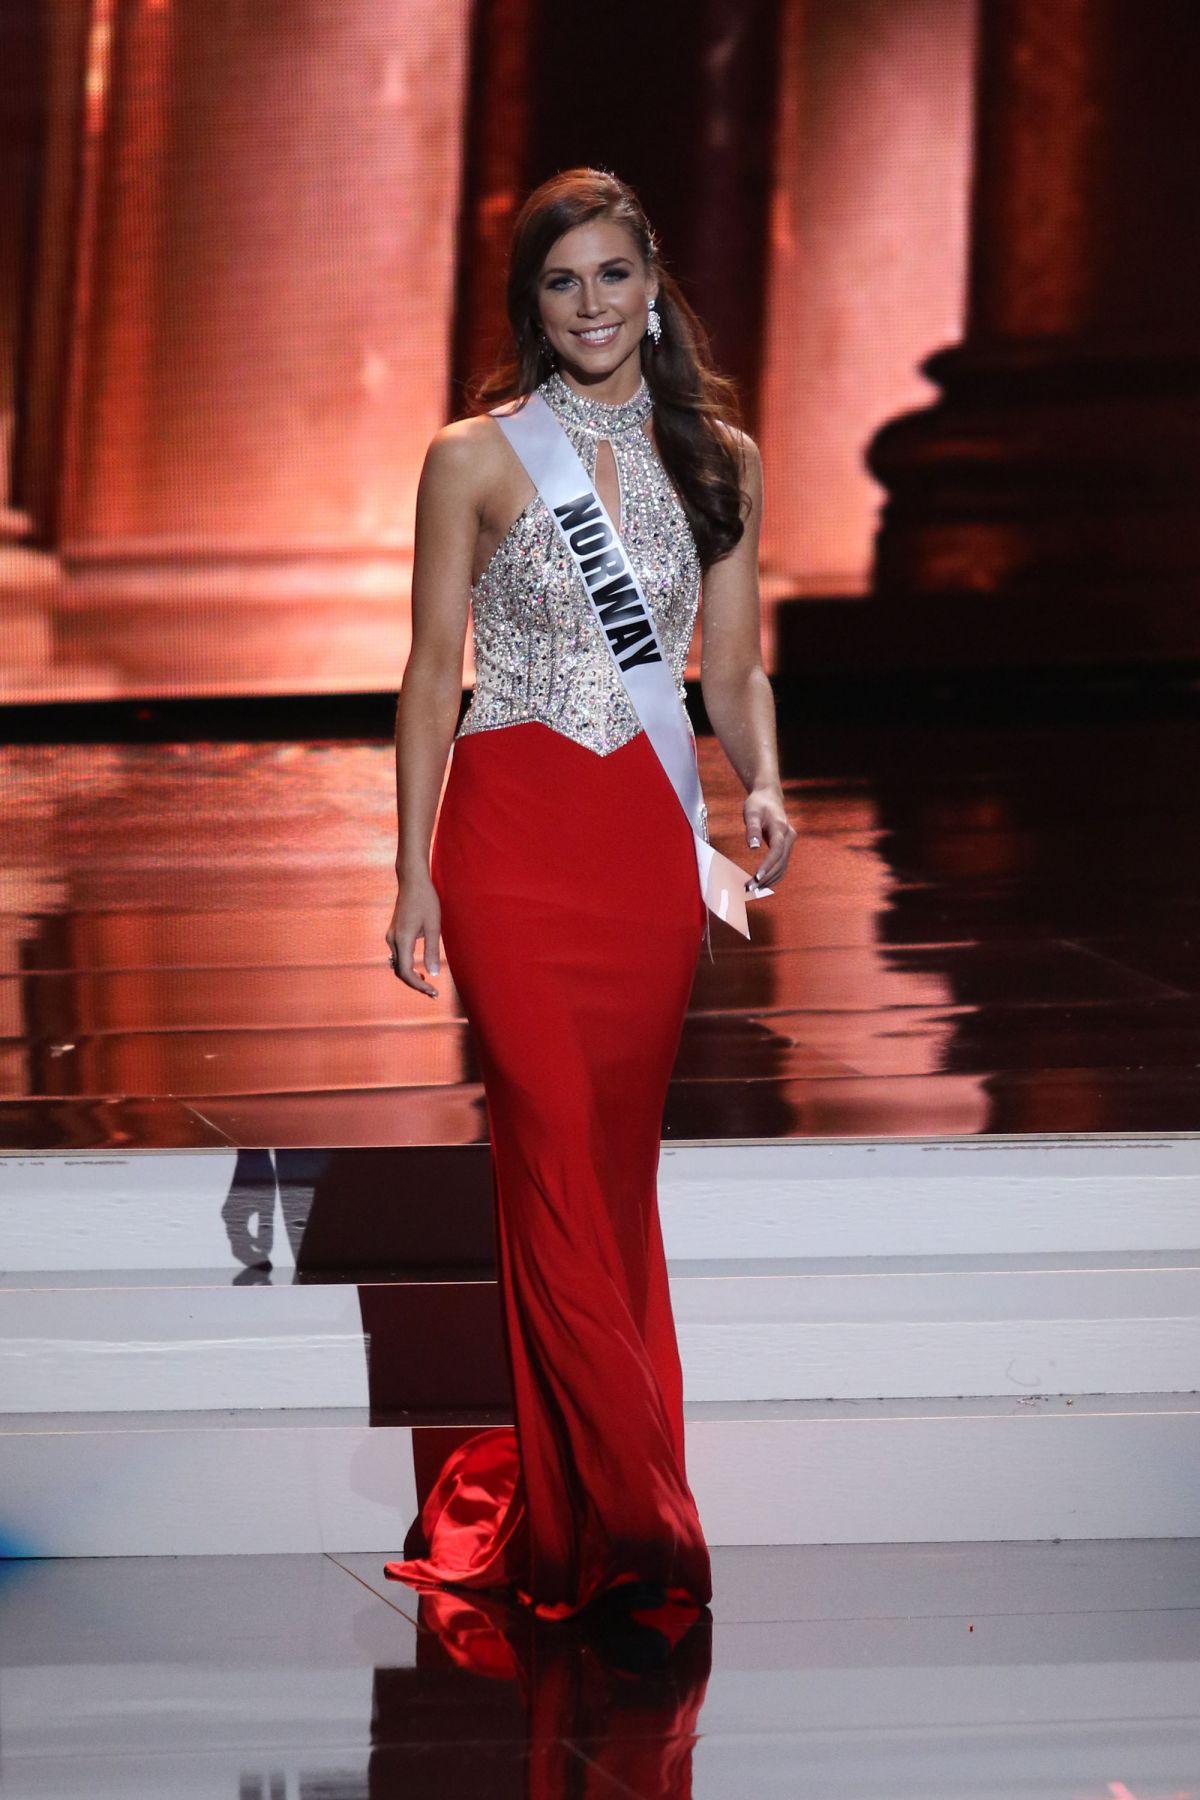 MARTINE RODSETH - Miss Universe 2015 Preliminary Round 12/16/2015